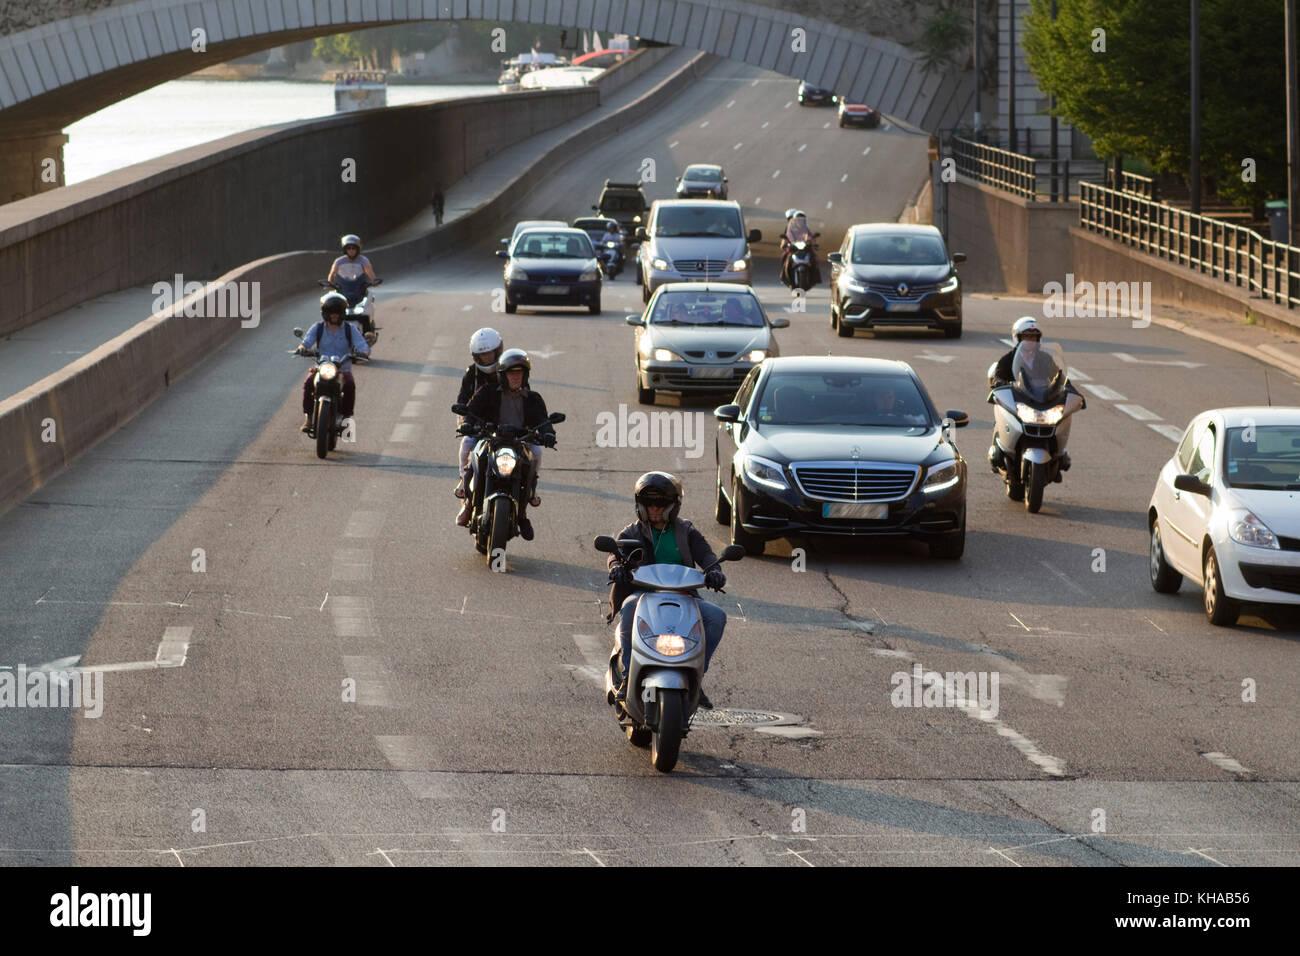 France, Paris, Quai de la Rapee, traffic on the highway. - Stock Image